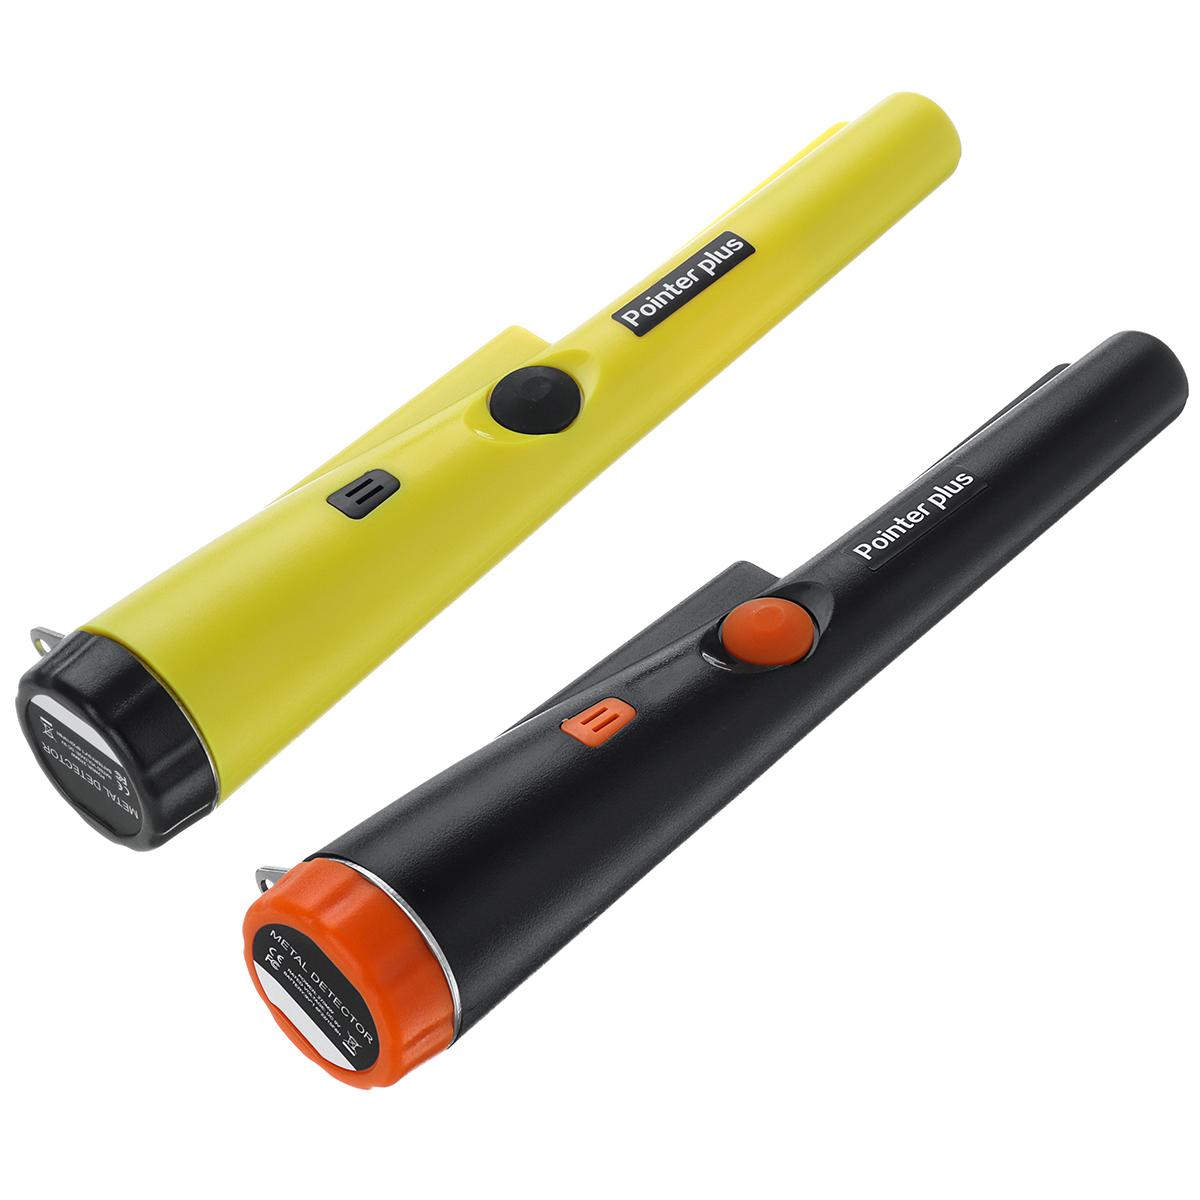 Metal Detector Pinpointing Digger Garden Detecting Waterproof Black/ Yellow